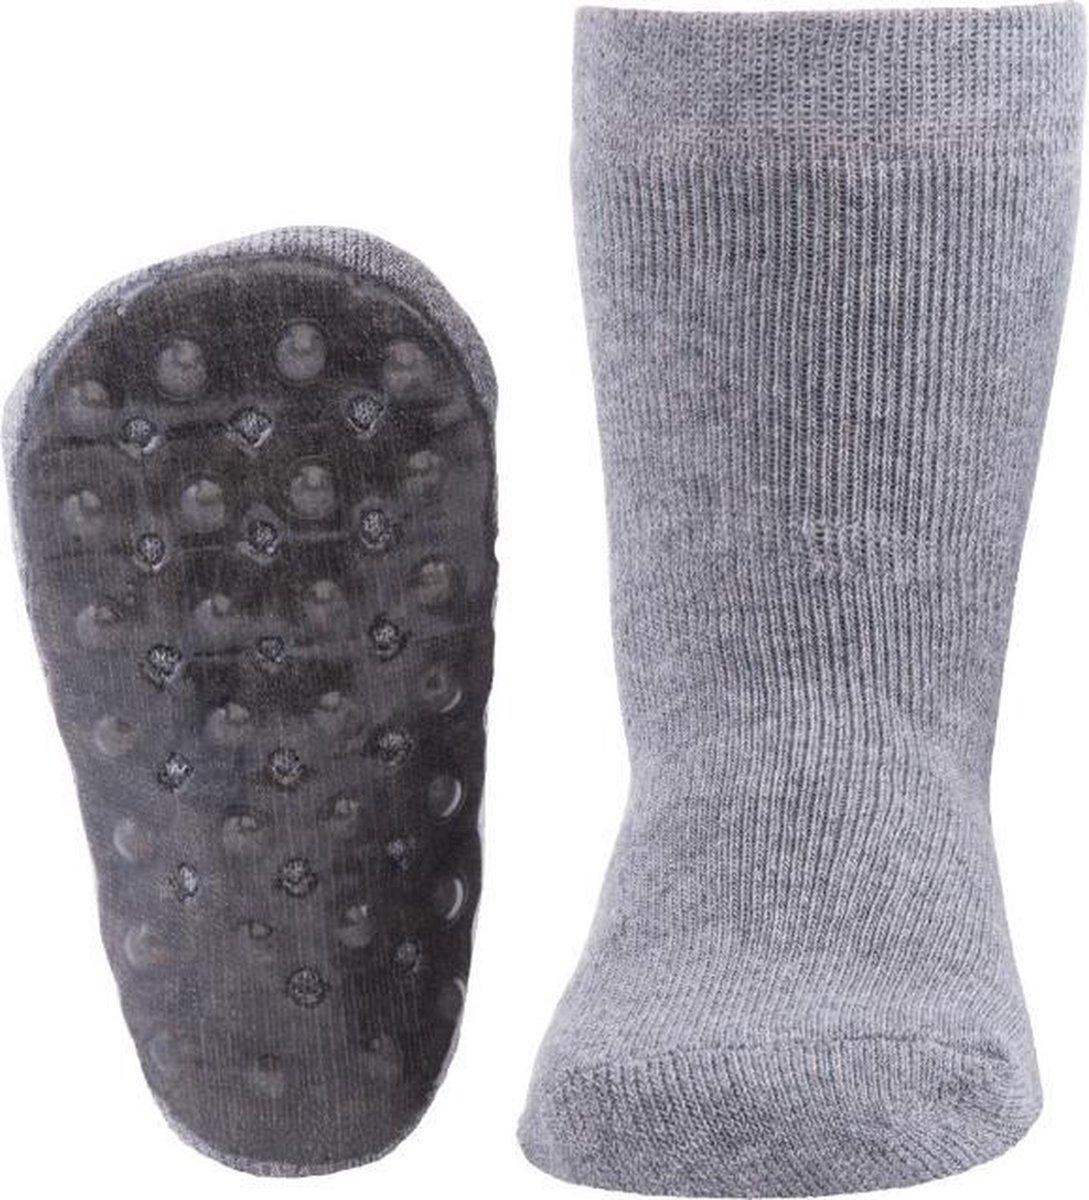 Ewers anti-slip sokken Stoppi uni grijs melee Maat: 19-20 - Ewers